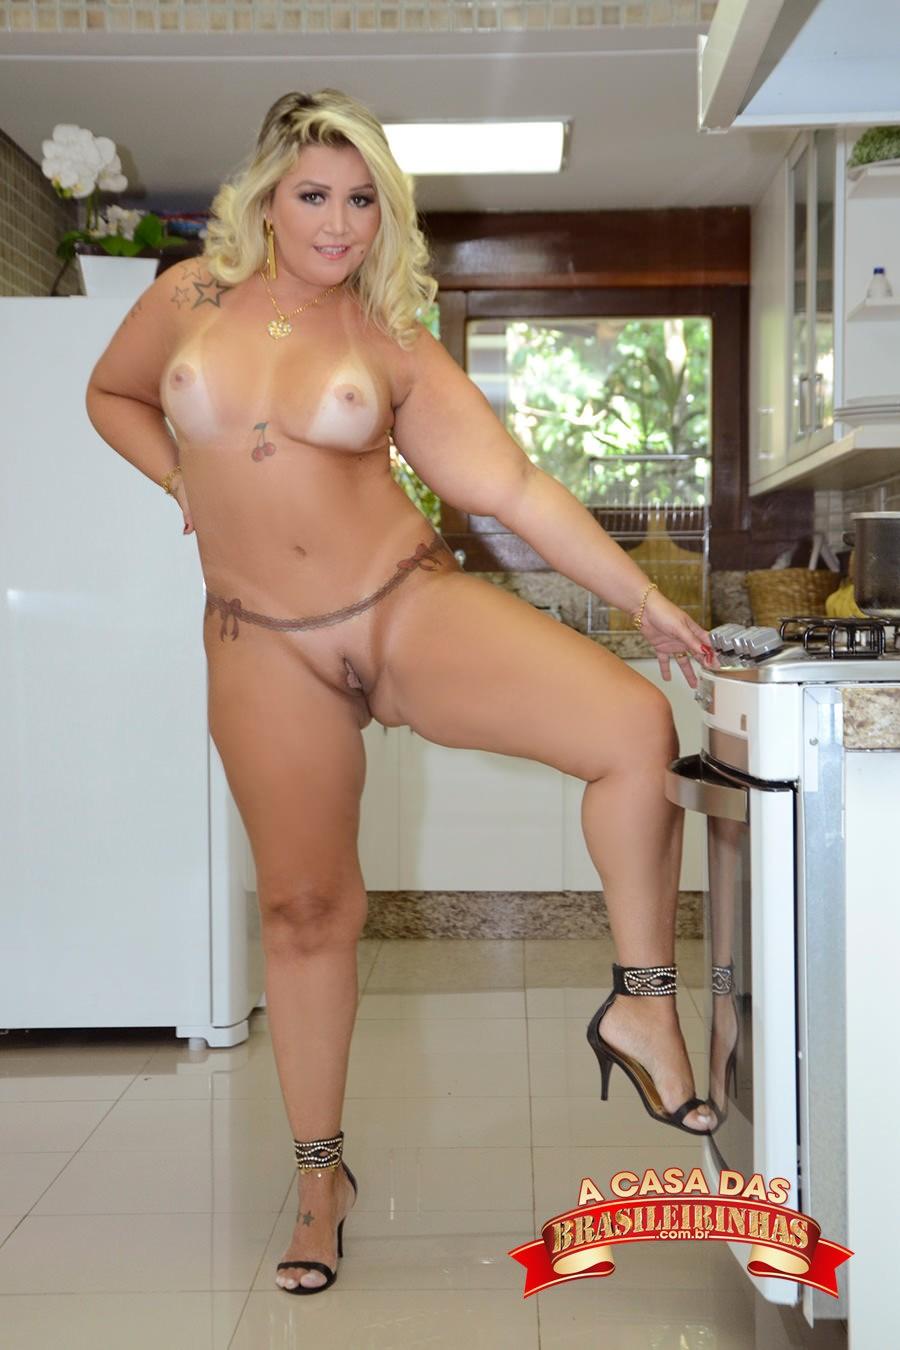 Ester-Mancini-na-cozinha.jpg